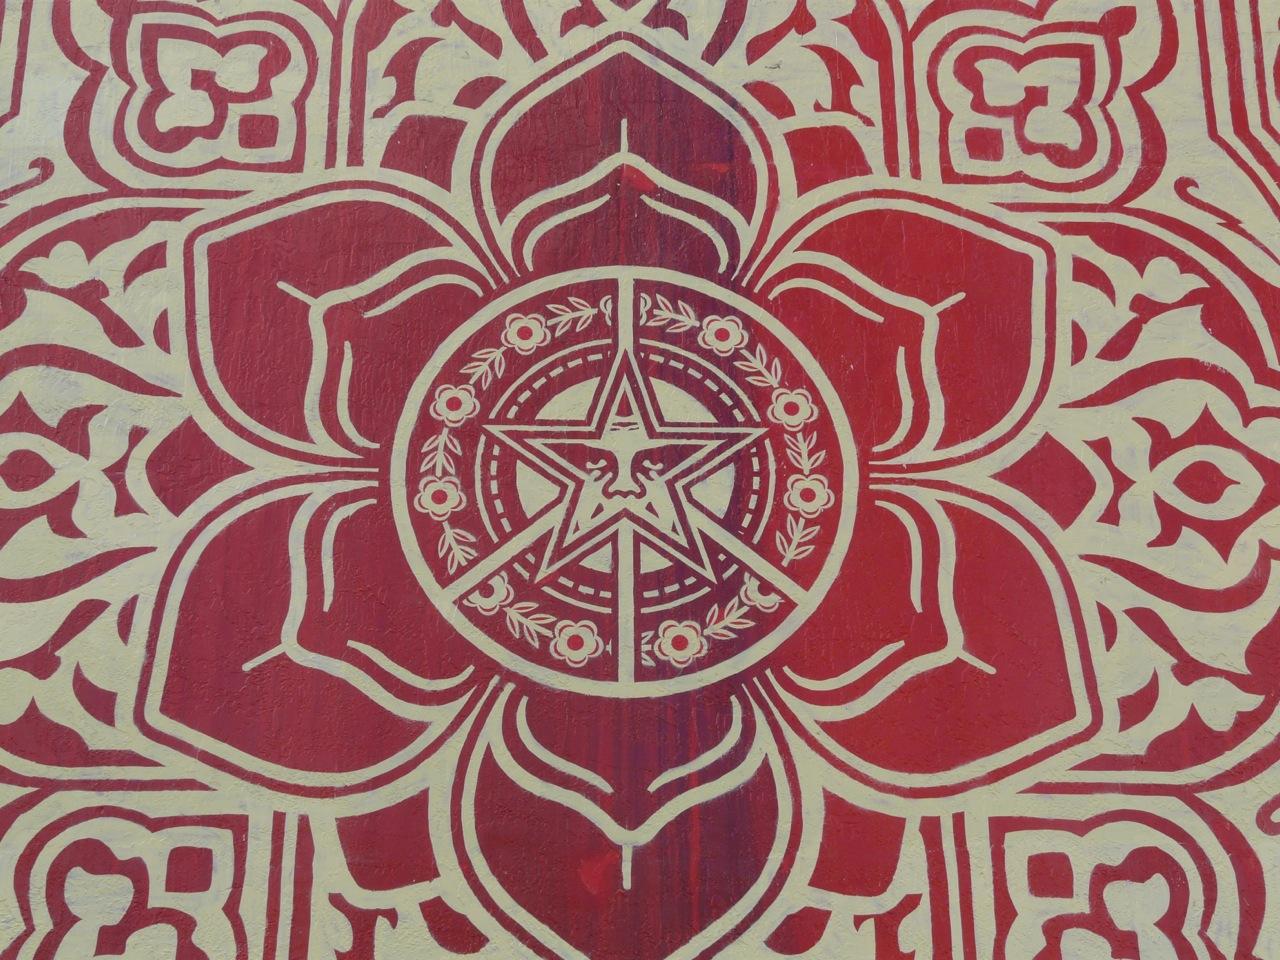 Shepard Fairey Wallpaper Obey Discuss shepard fairey here 1280x960